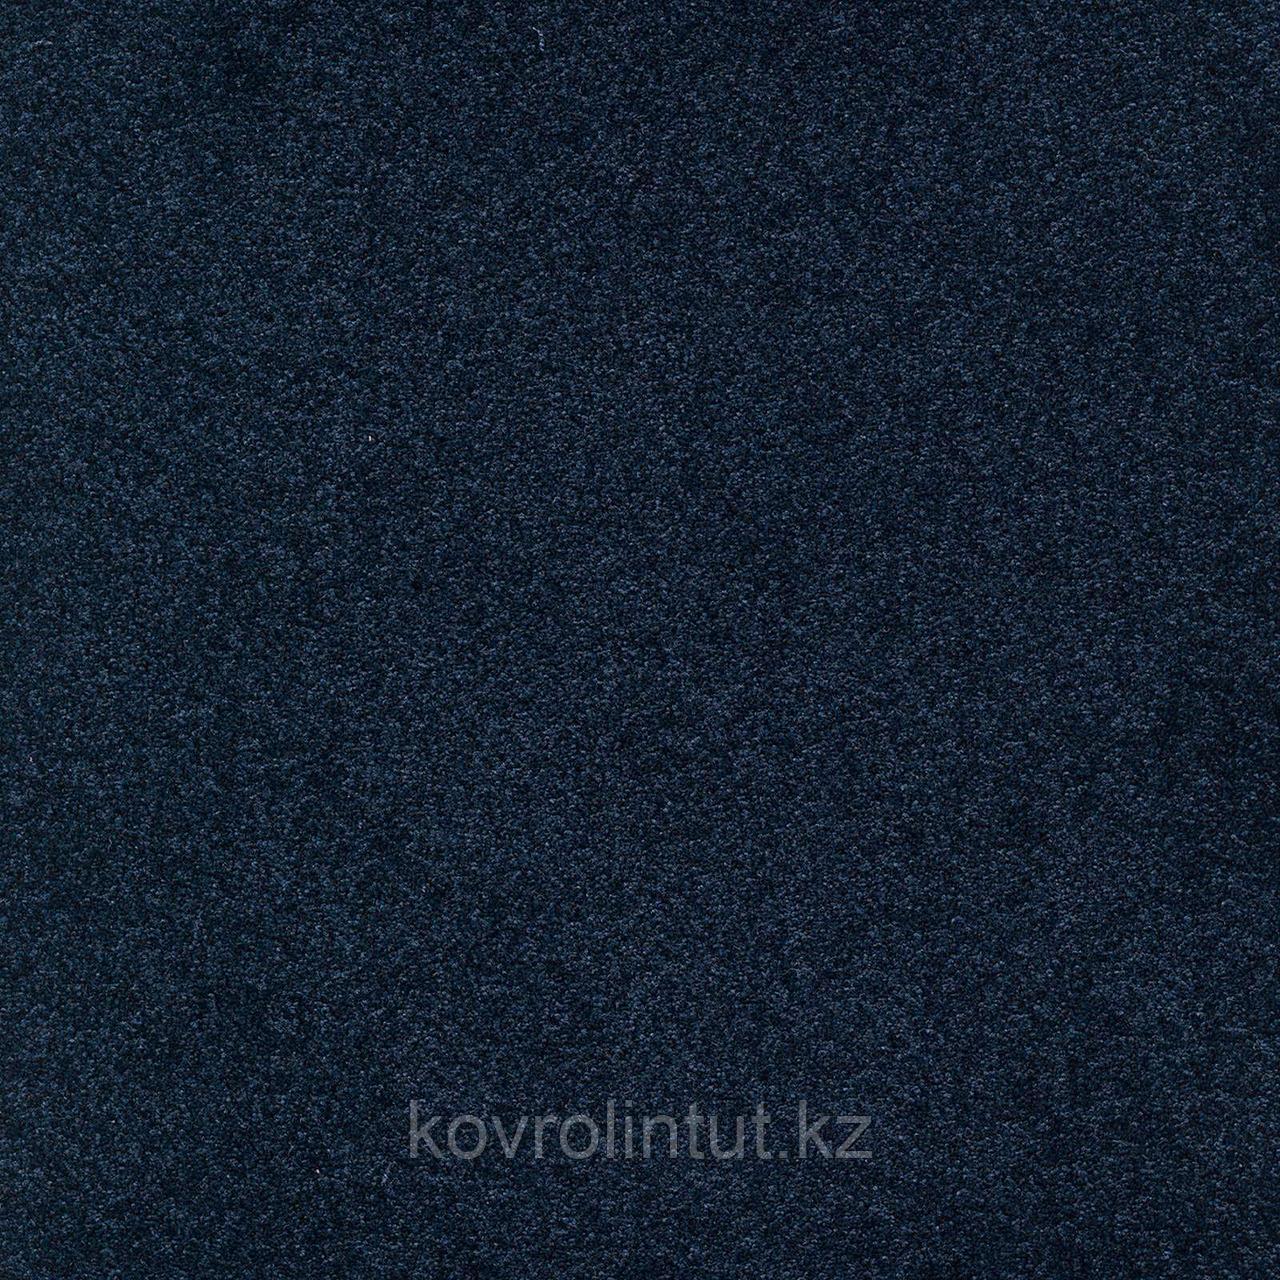 Плитка ковровая Modulyss, Gleam 581, 50х50